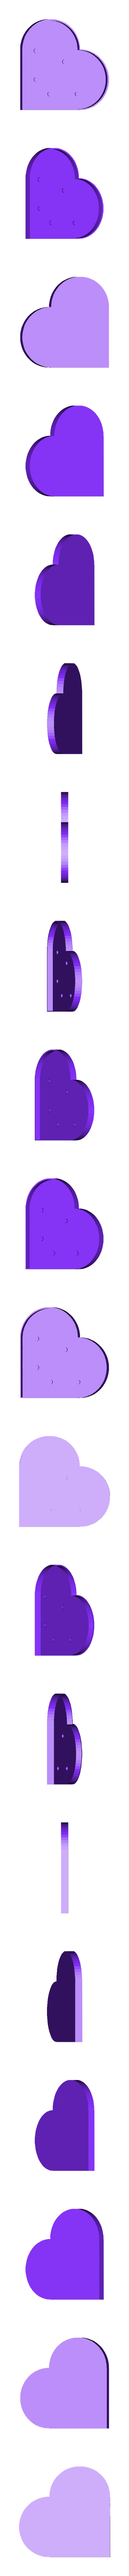 heart_planter_cover.stl Download free SCAD file Heart planter / box • 3D print template, gillesromani